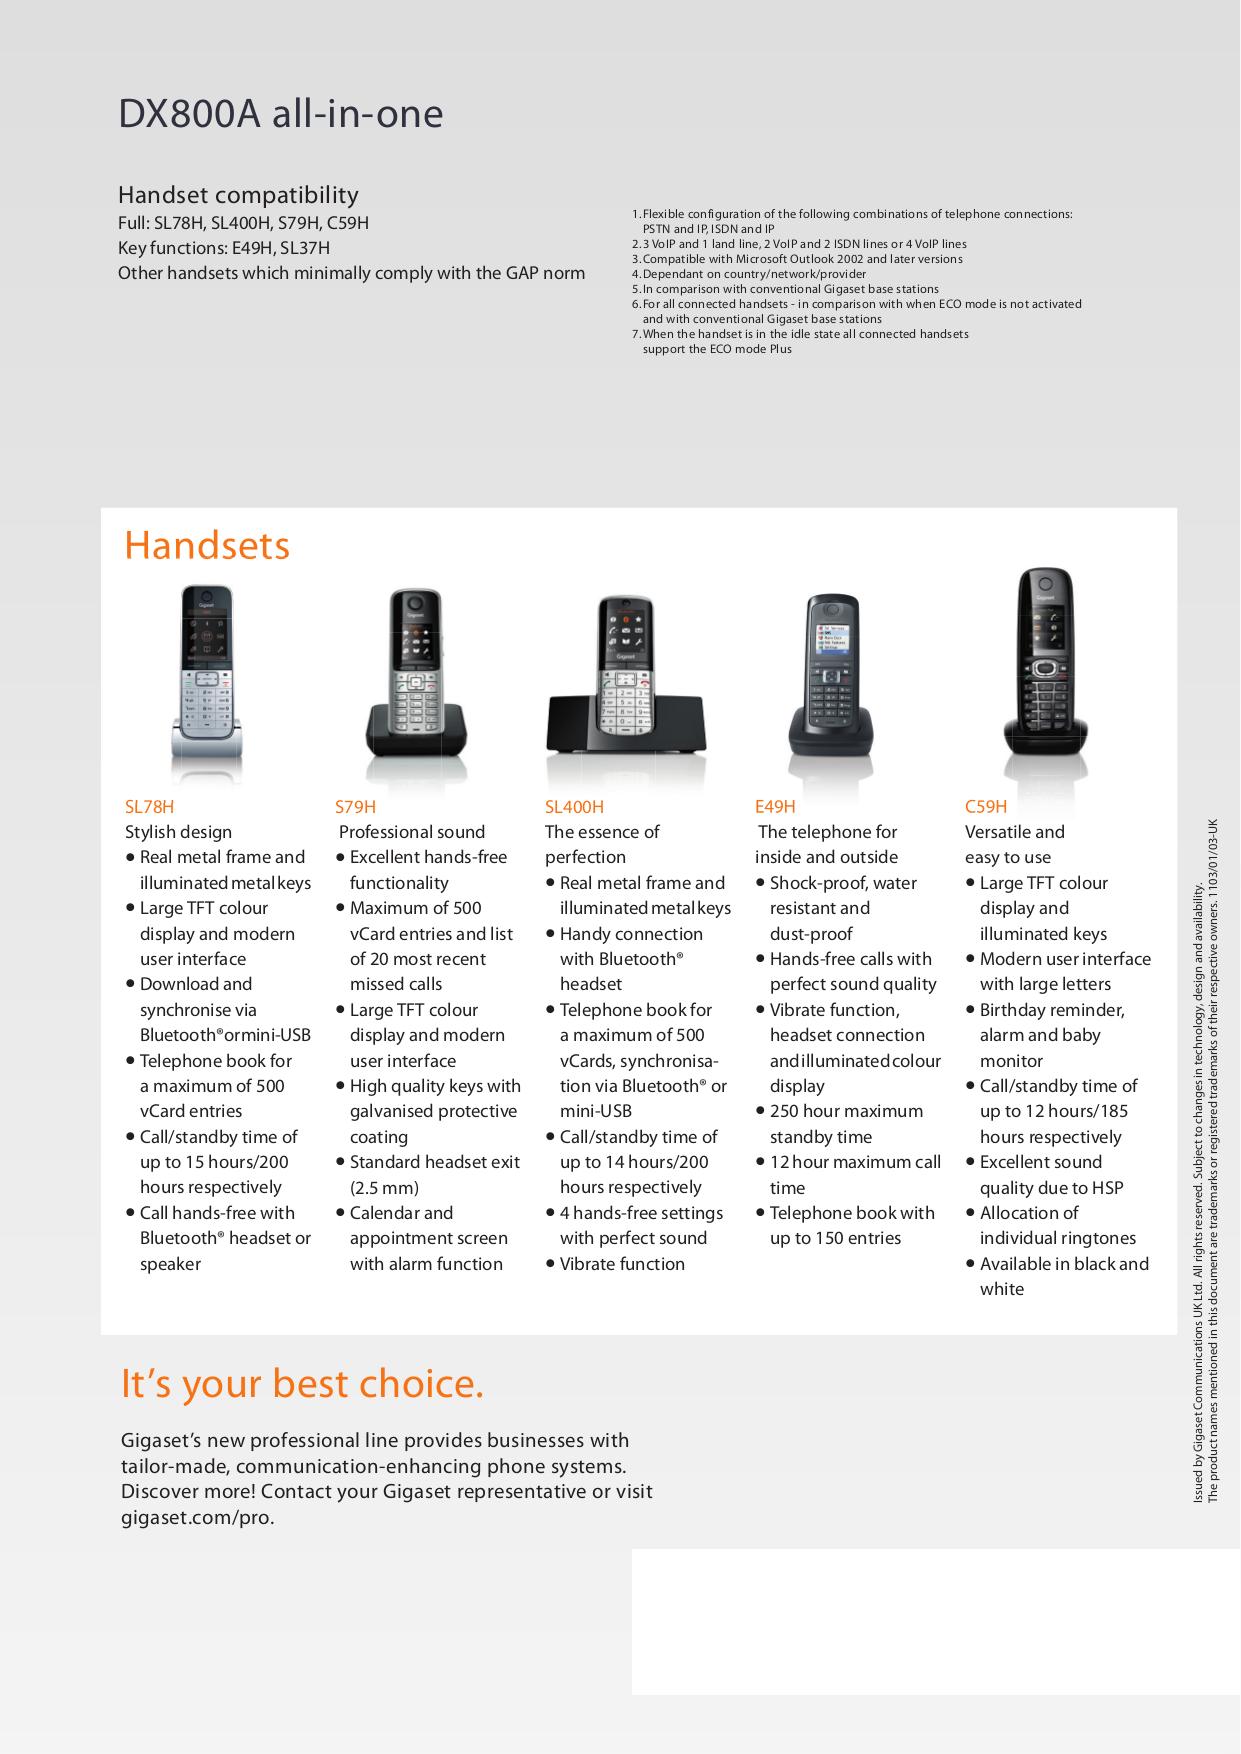 pdf manual for panasonic fax machine dx 800